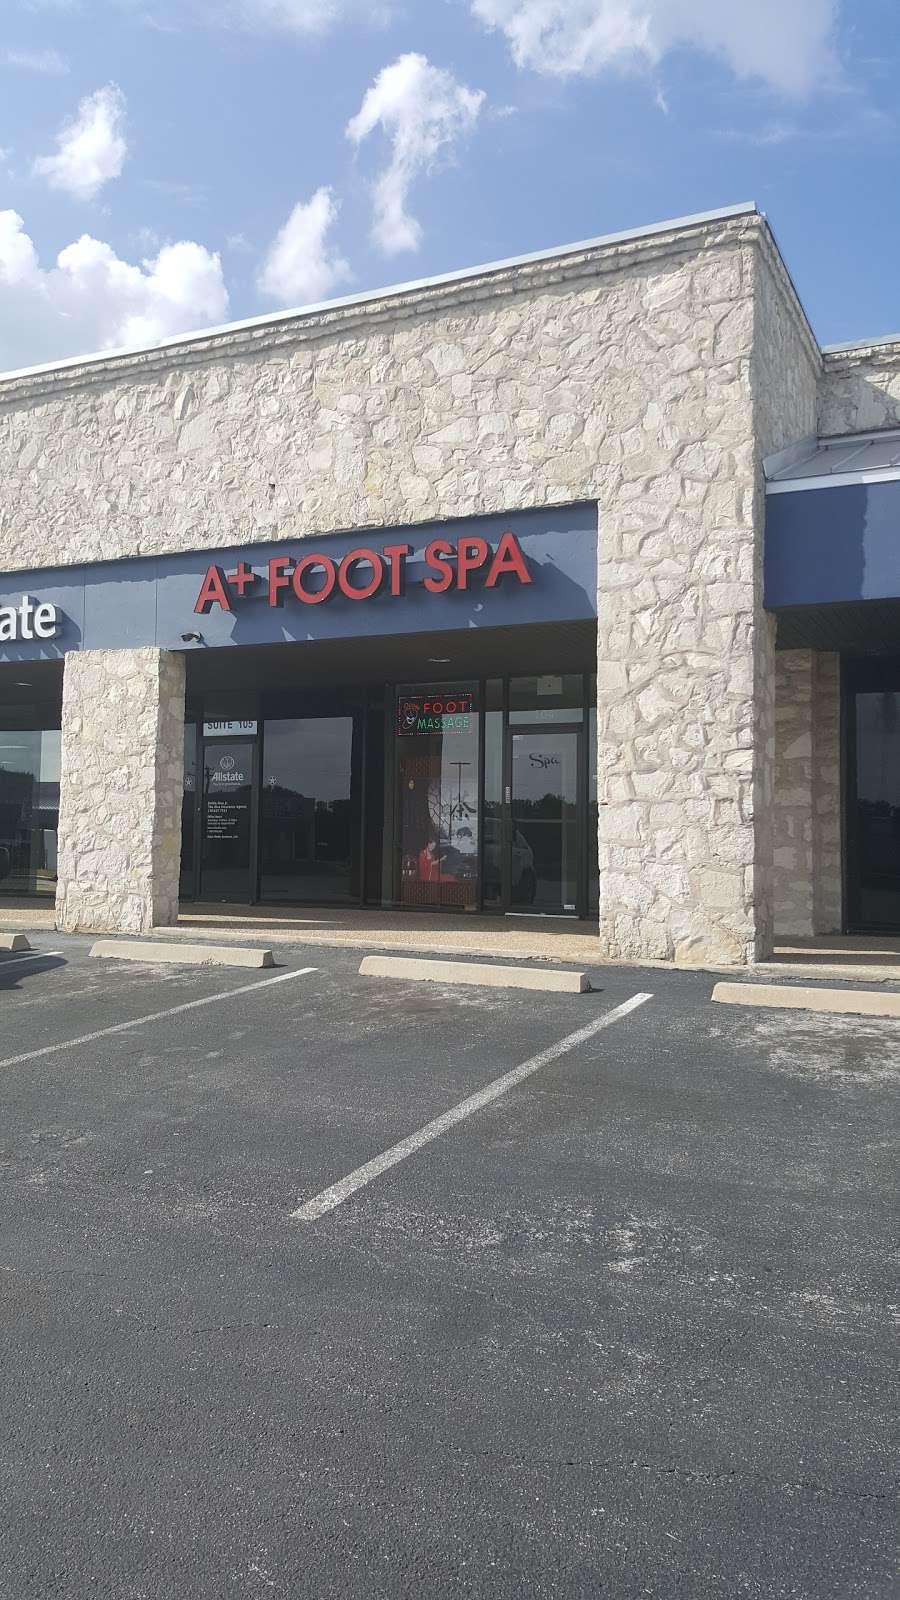 A+ Foot Spa - spa  | Photo 9 of 10 | Address: 9323 Perrin Beitel Rd #104, San Antonio, TX 78217, USA | Phone: (210) 590-1221